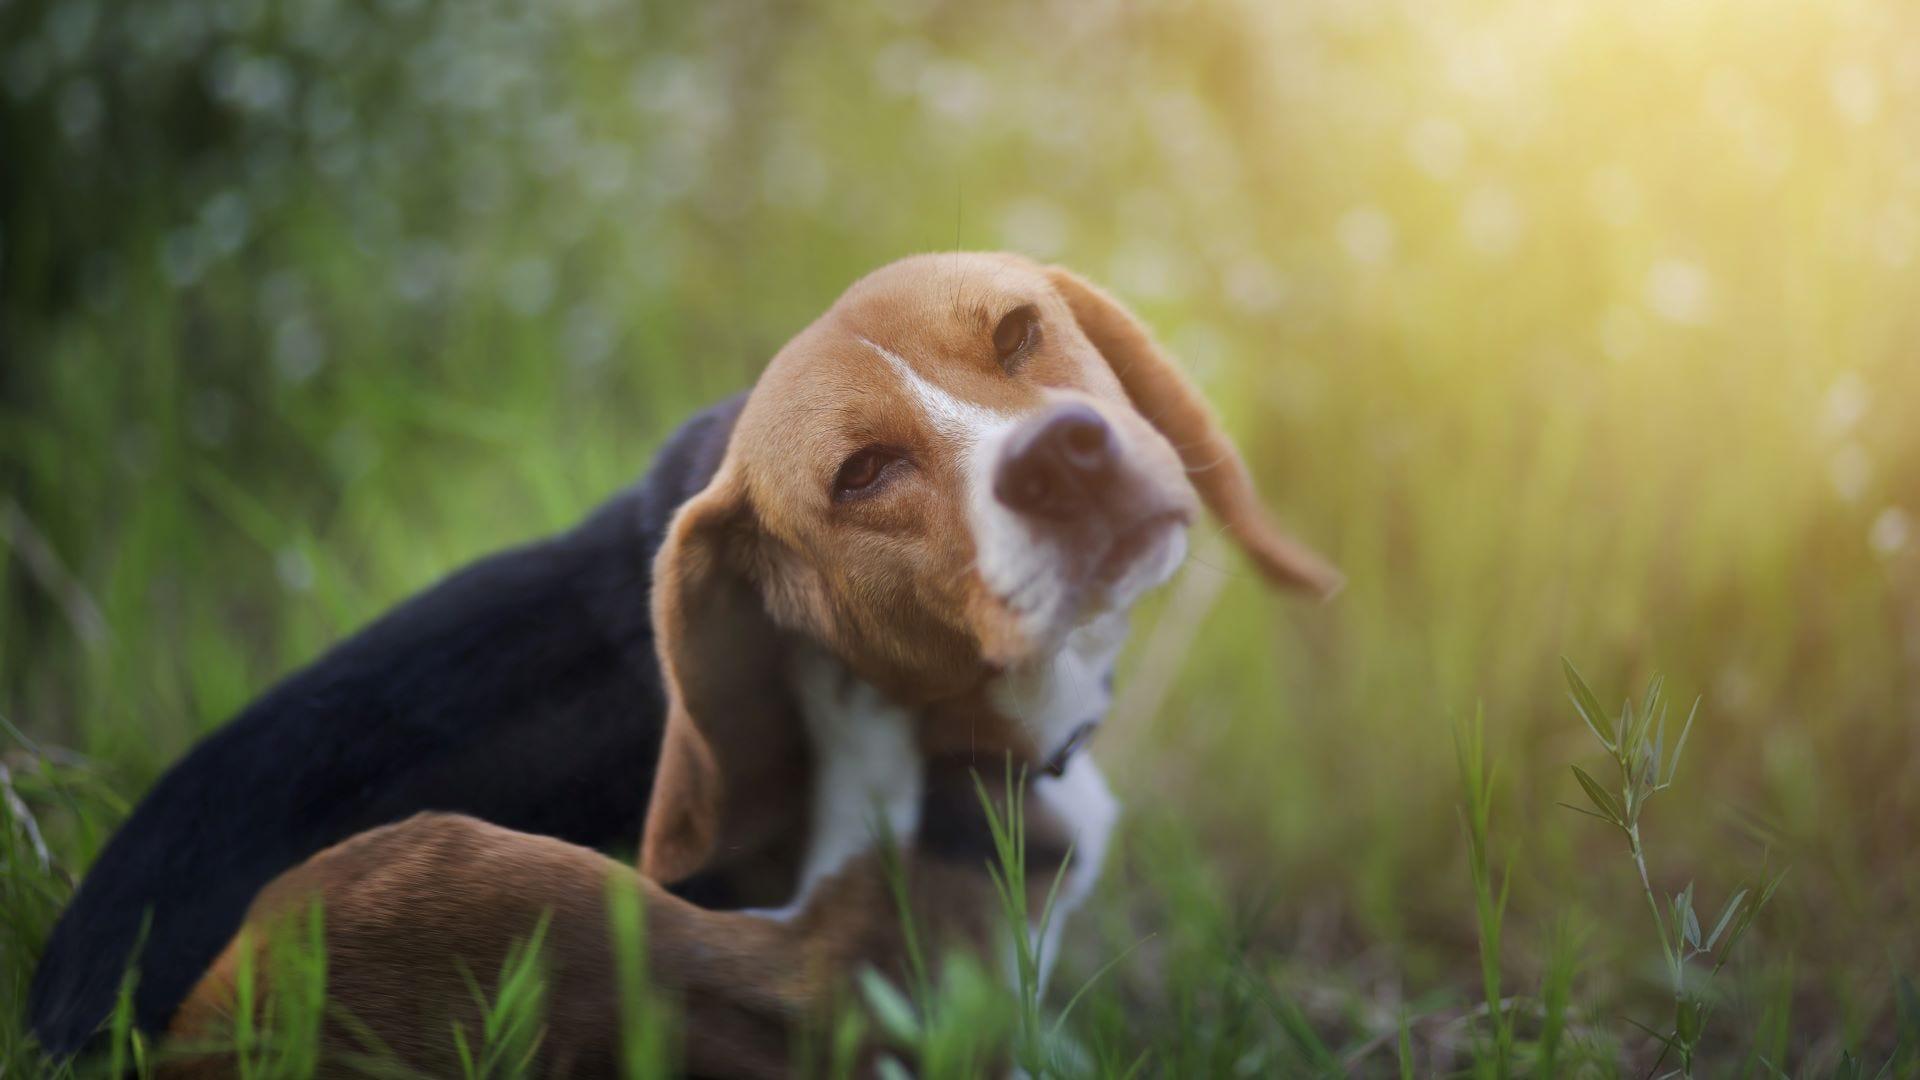 A beagle scratching in tall grass.